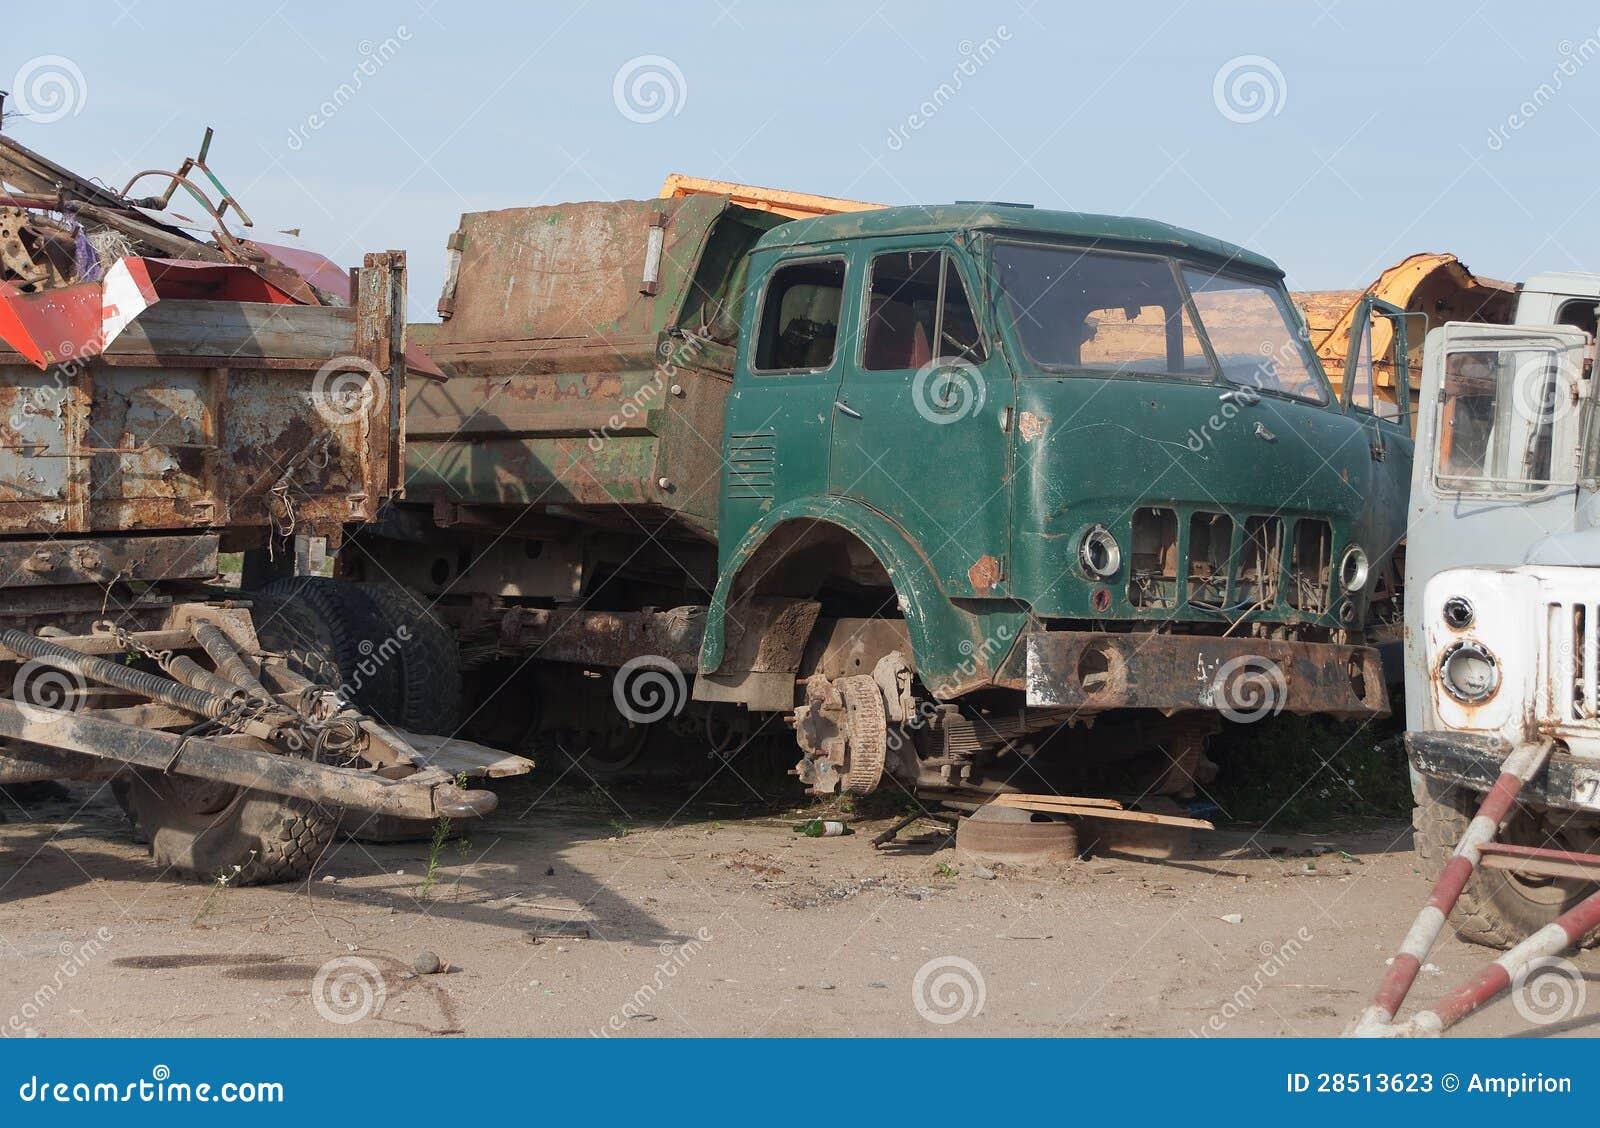 Understanding a Vehicle History Report